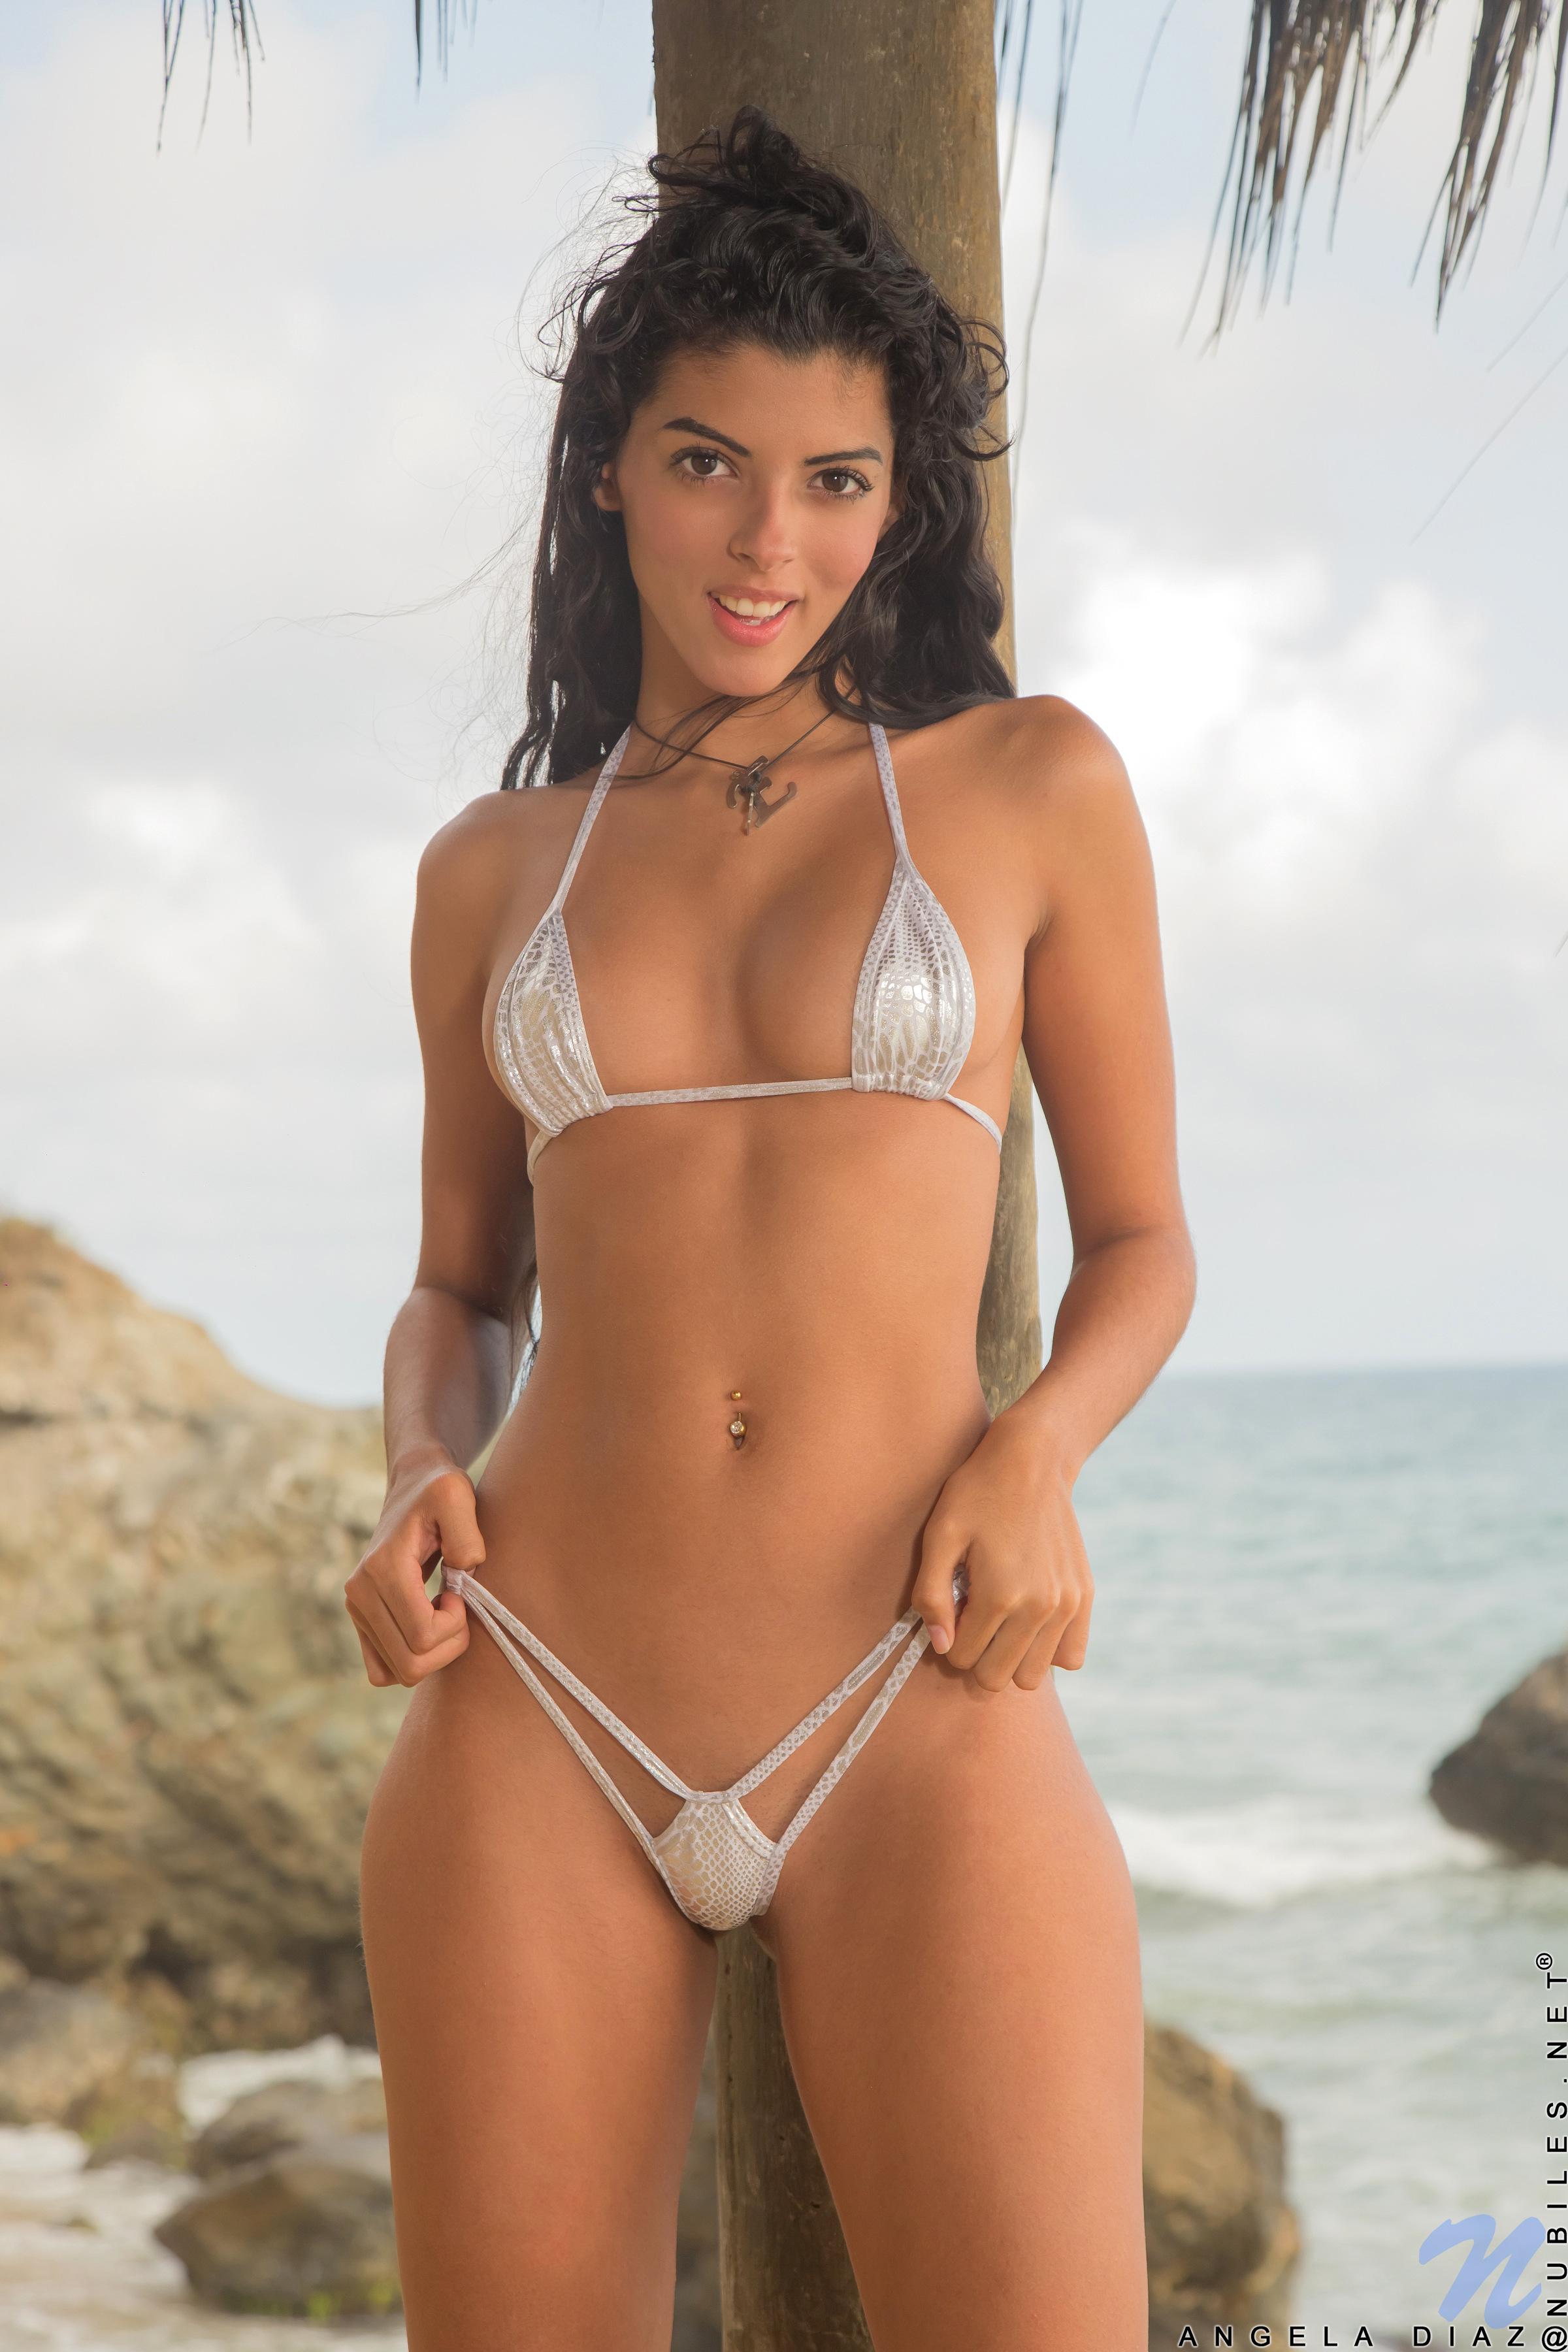 Bikini Model Nackt